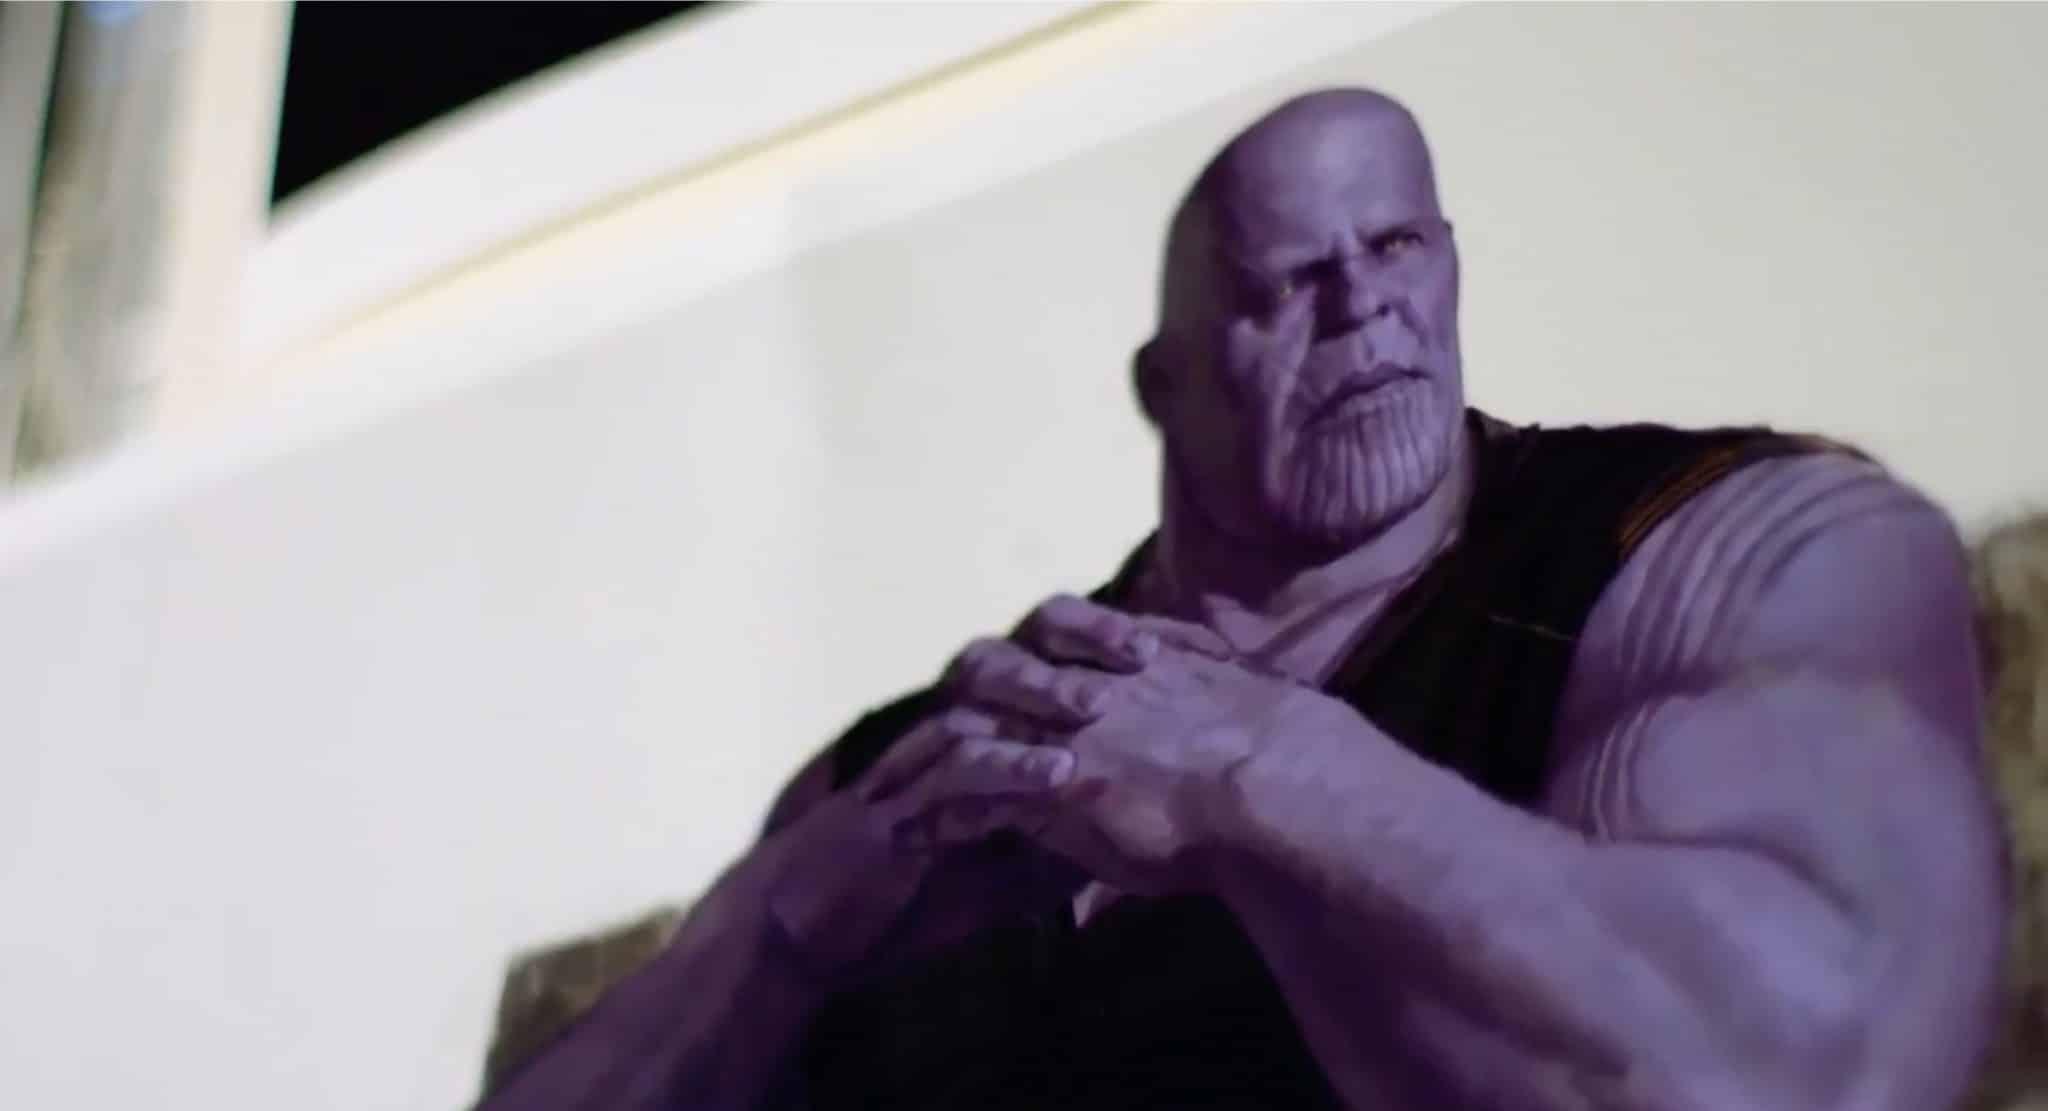 Thanos bez helmy!; Zdroj: slashfilm.com